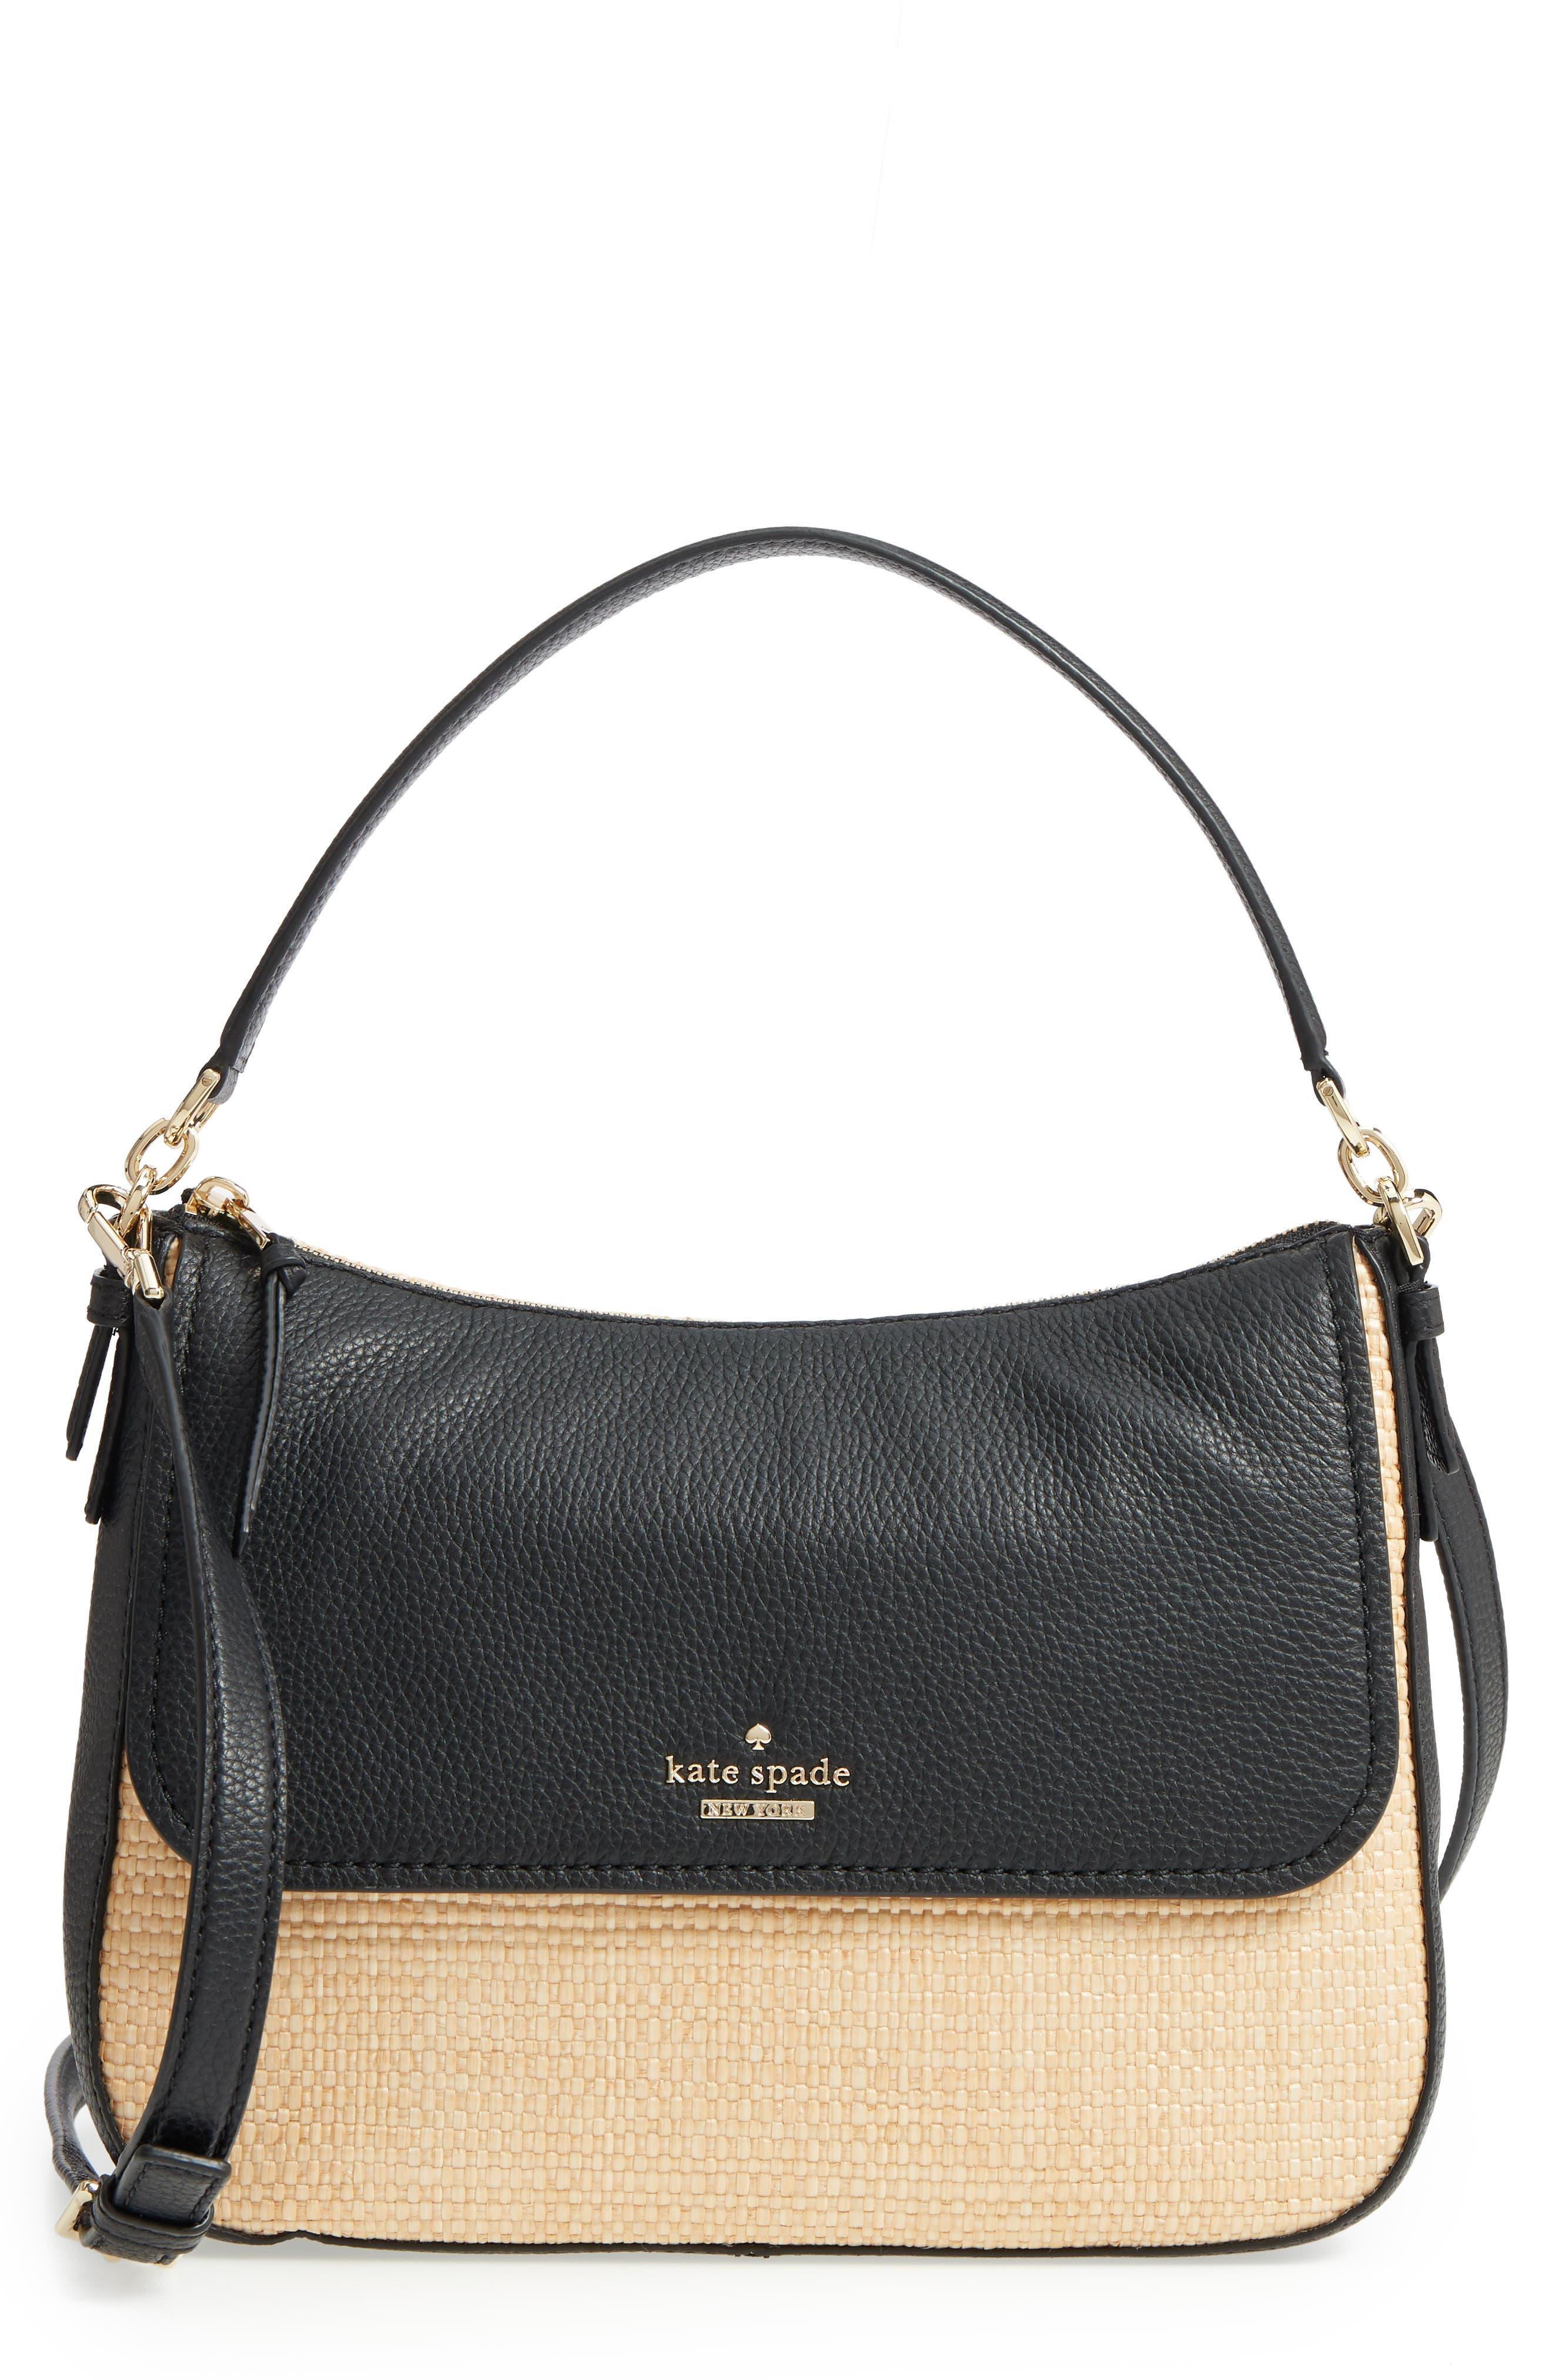 KATE SPADE NEW YORK,                             jackson street - colette straw & leather satchel,                             Main thumbnail 1, color,                             257